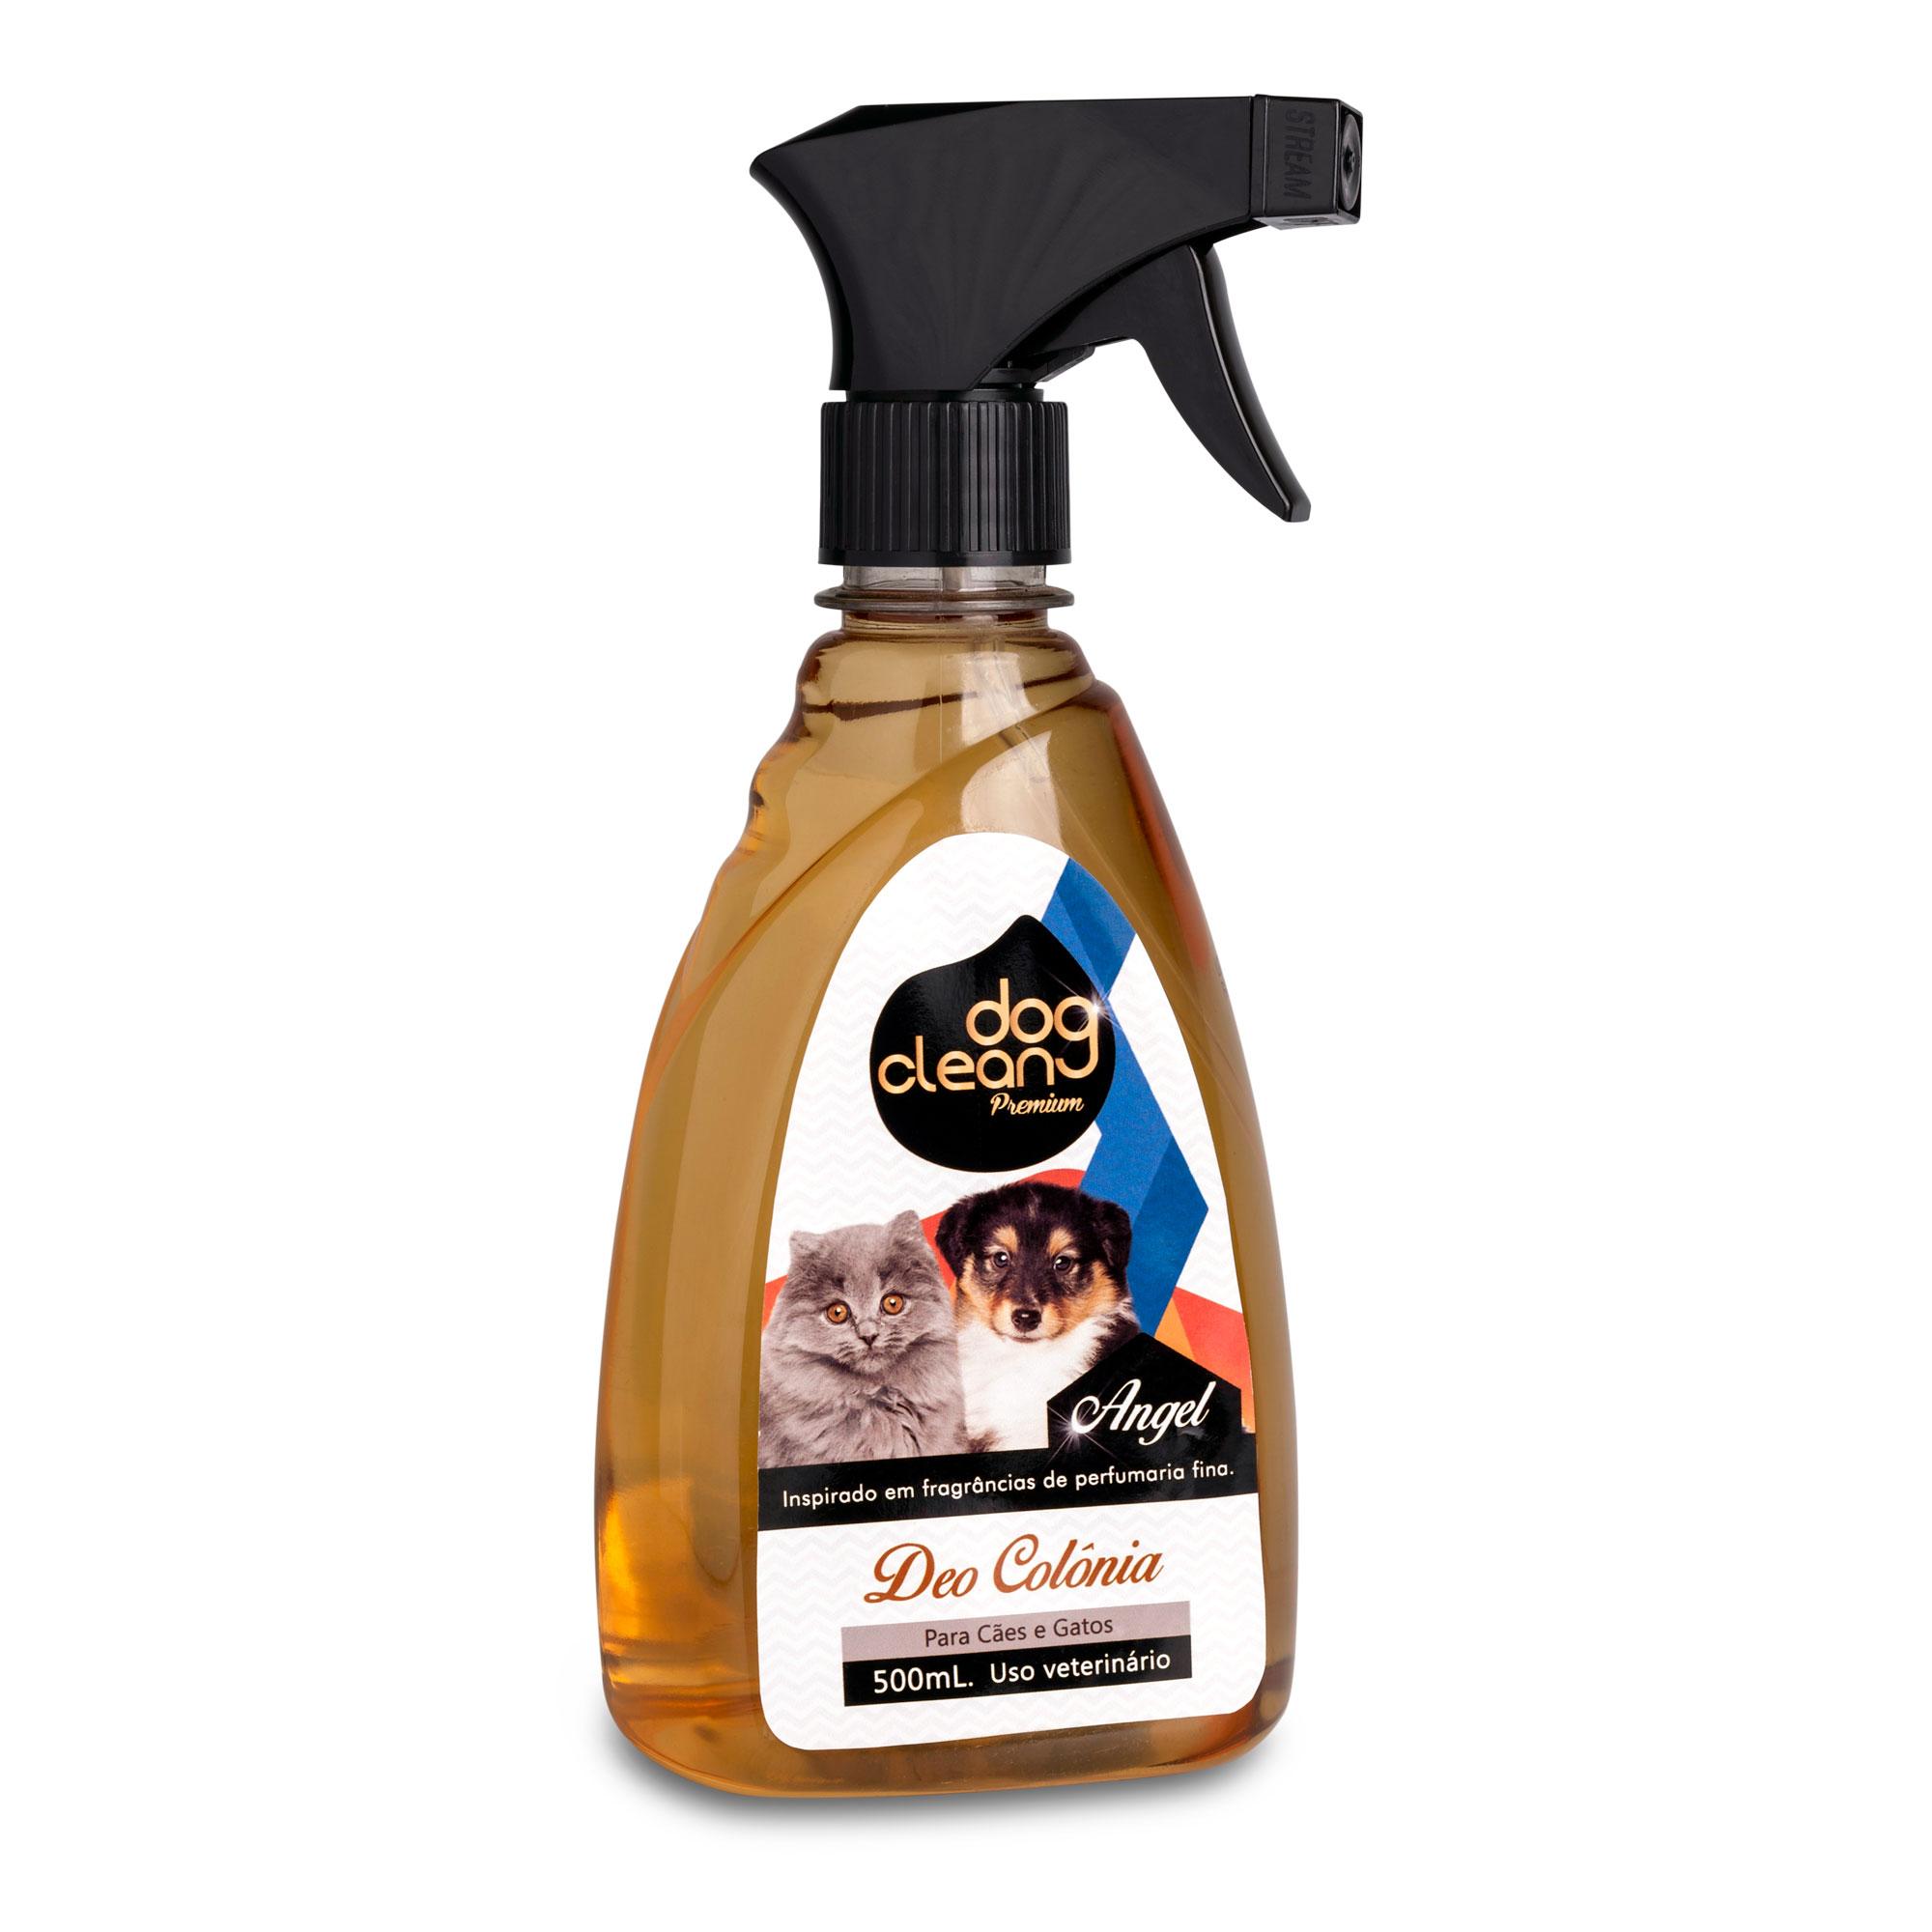 Perfume Deo Colônia Angel 500ml Dog Clean